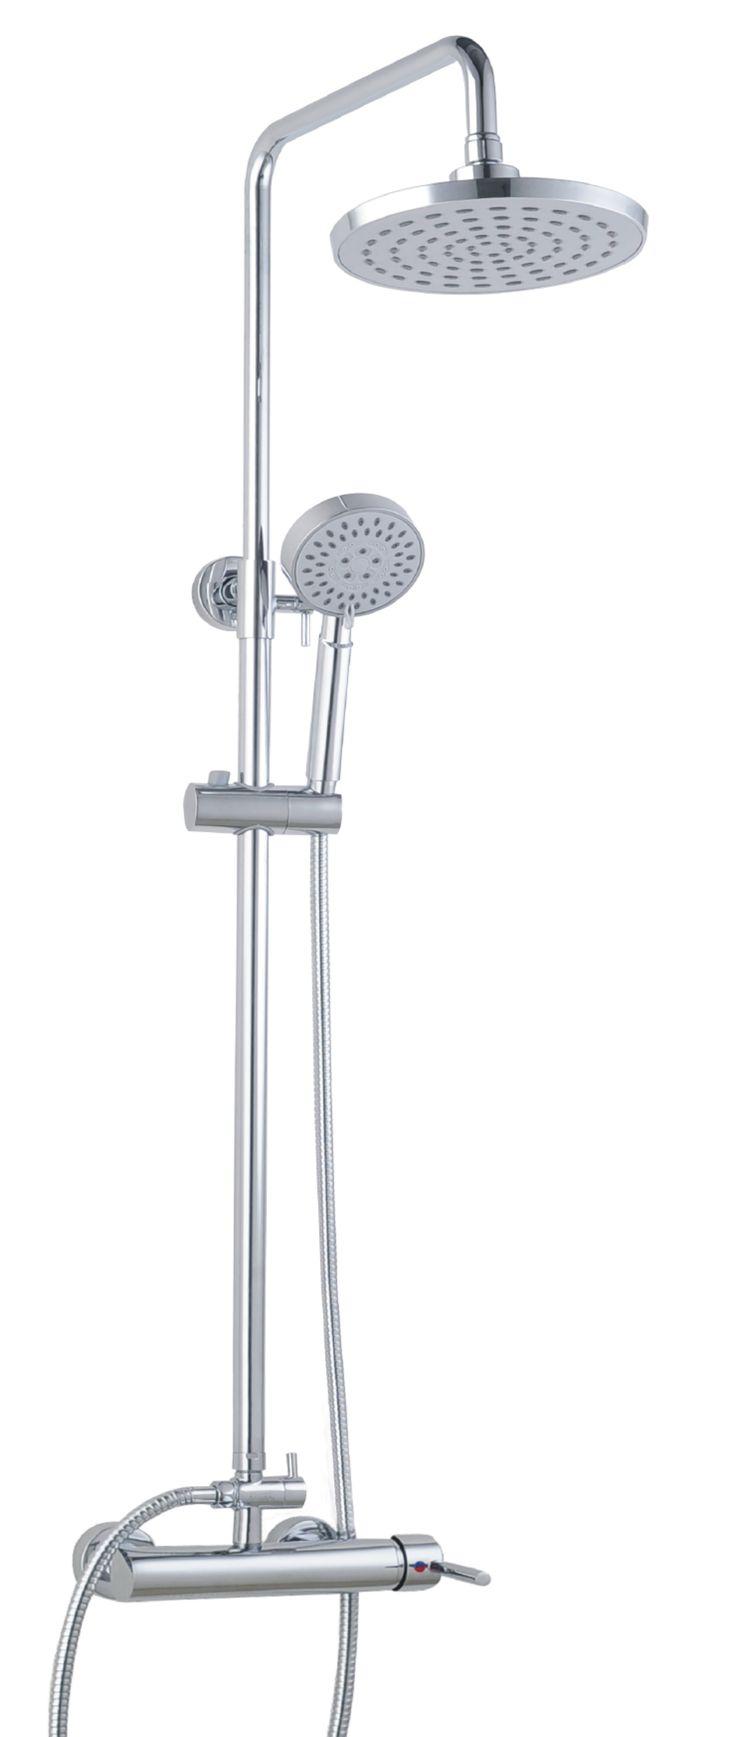 M s de 25 ideas incre bles sobre grifos de ducha en for Grifos de ducha termostaticos precios